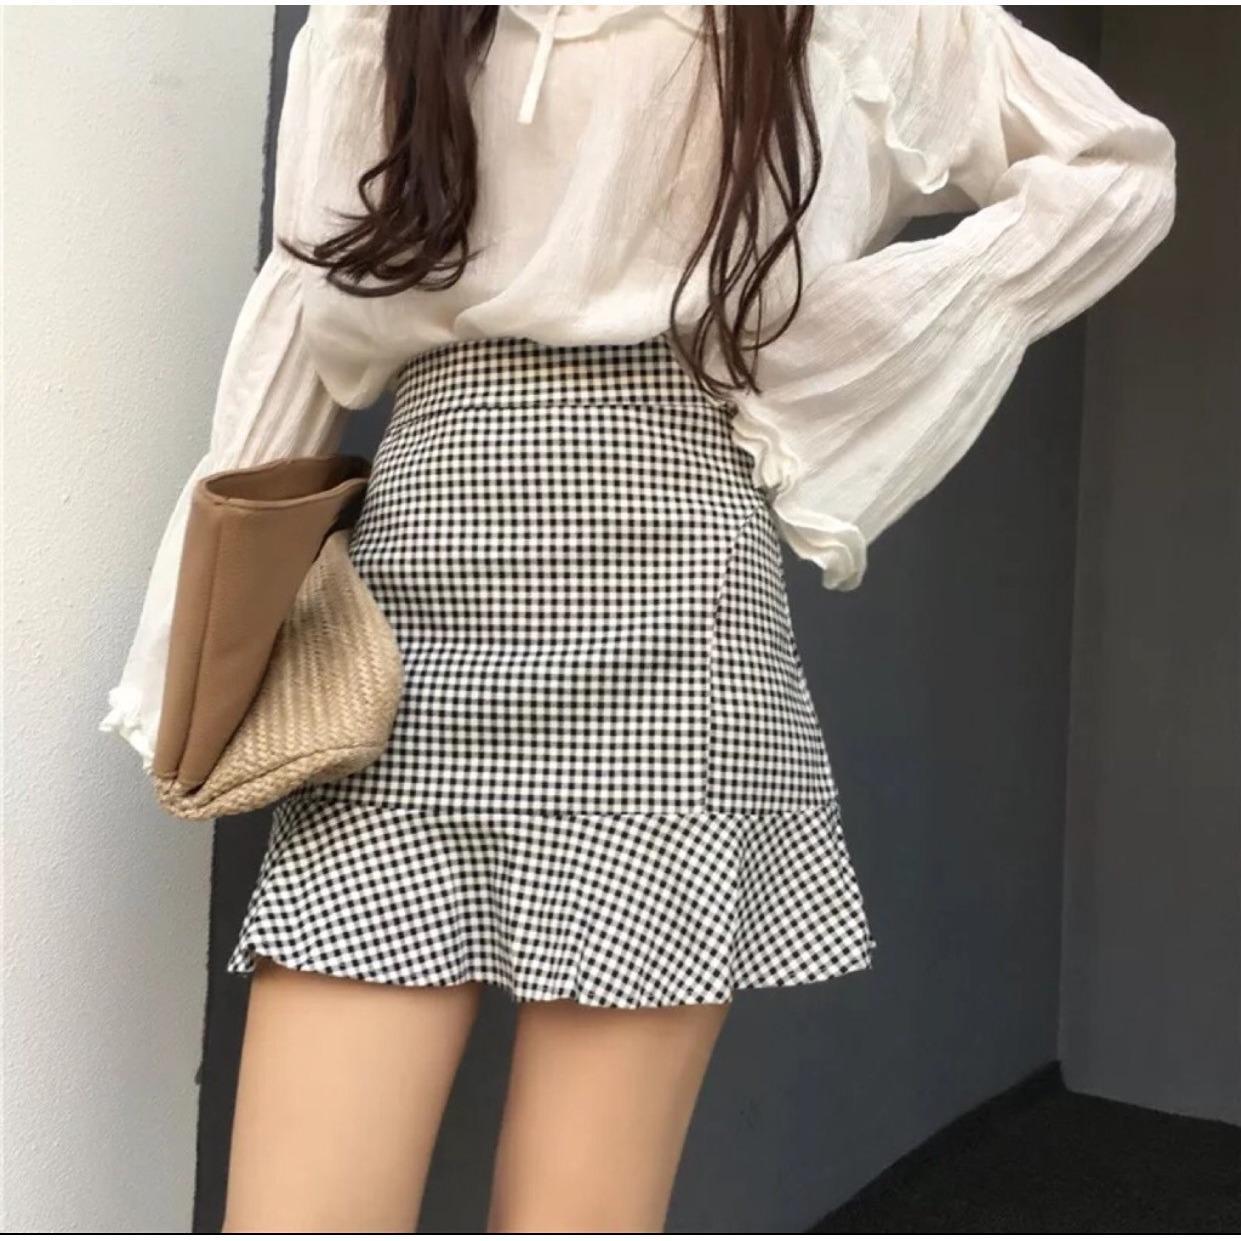 Black White Checkered Plaid Ruffled Skirt Best Buy